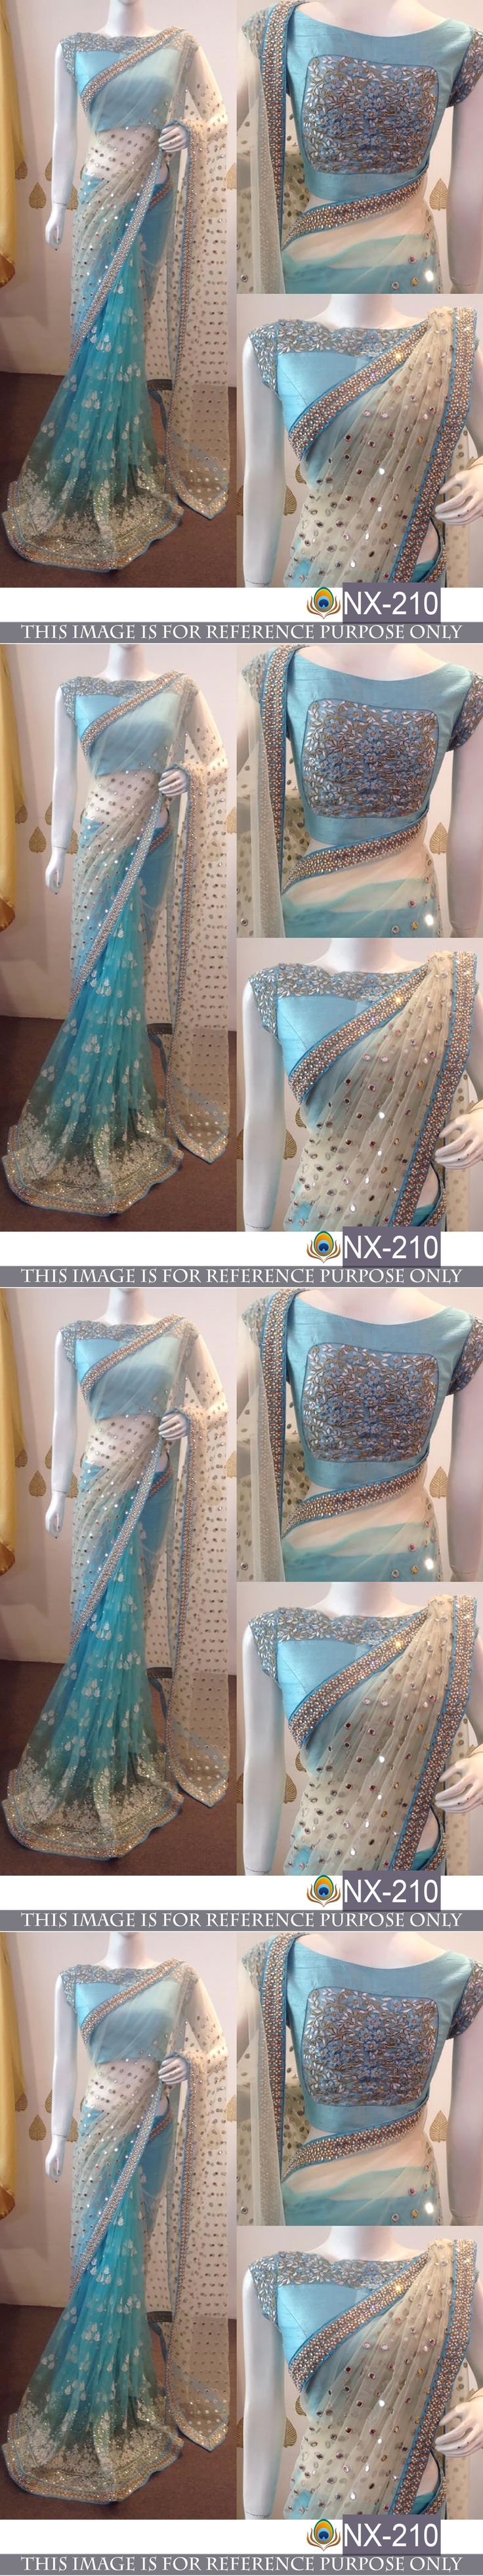 Sari Saree 155250: Bollywood Designer Saree Sari Lehenga Choli Indian Pakistani Party Wedding Wear -> BUY IT NOW ONLY: $56 on eBay!